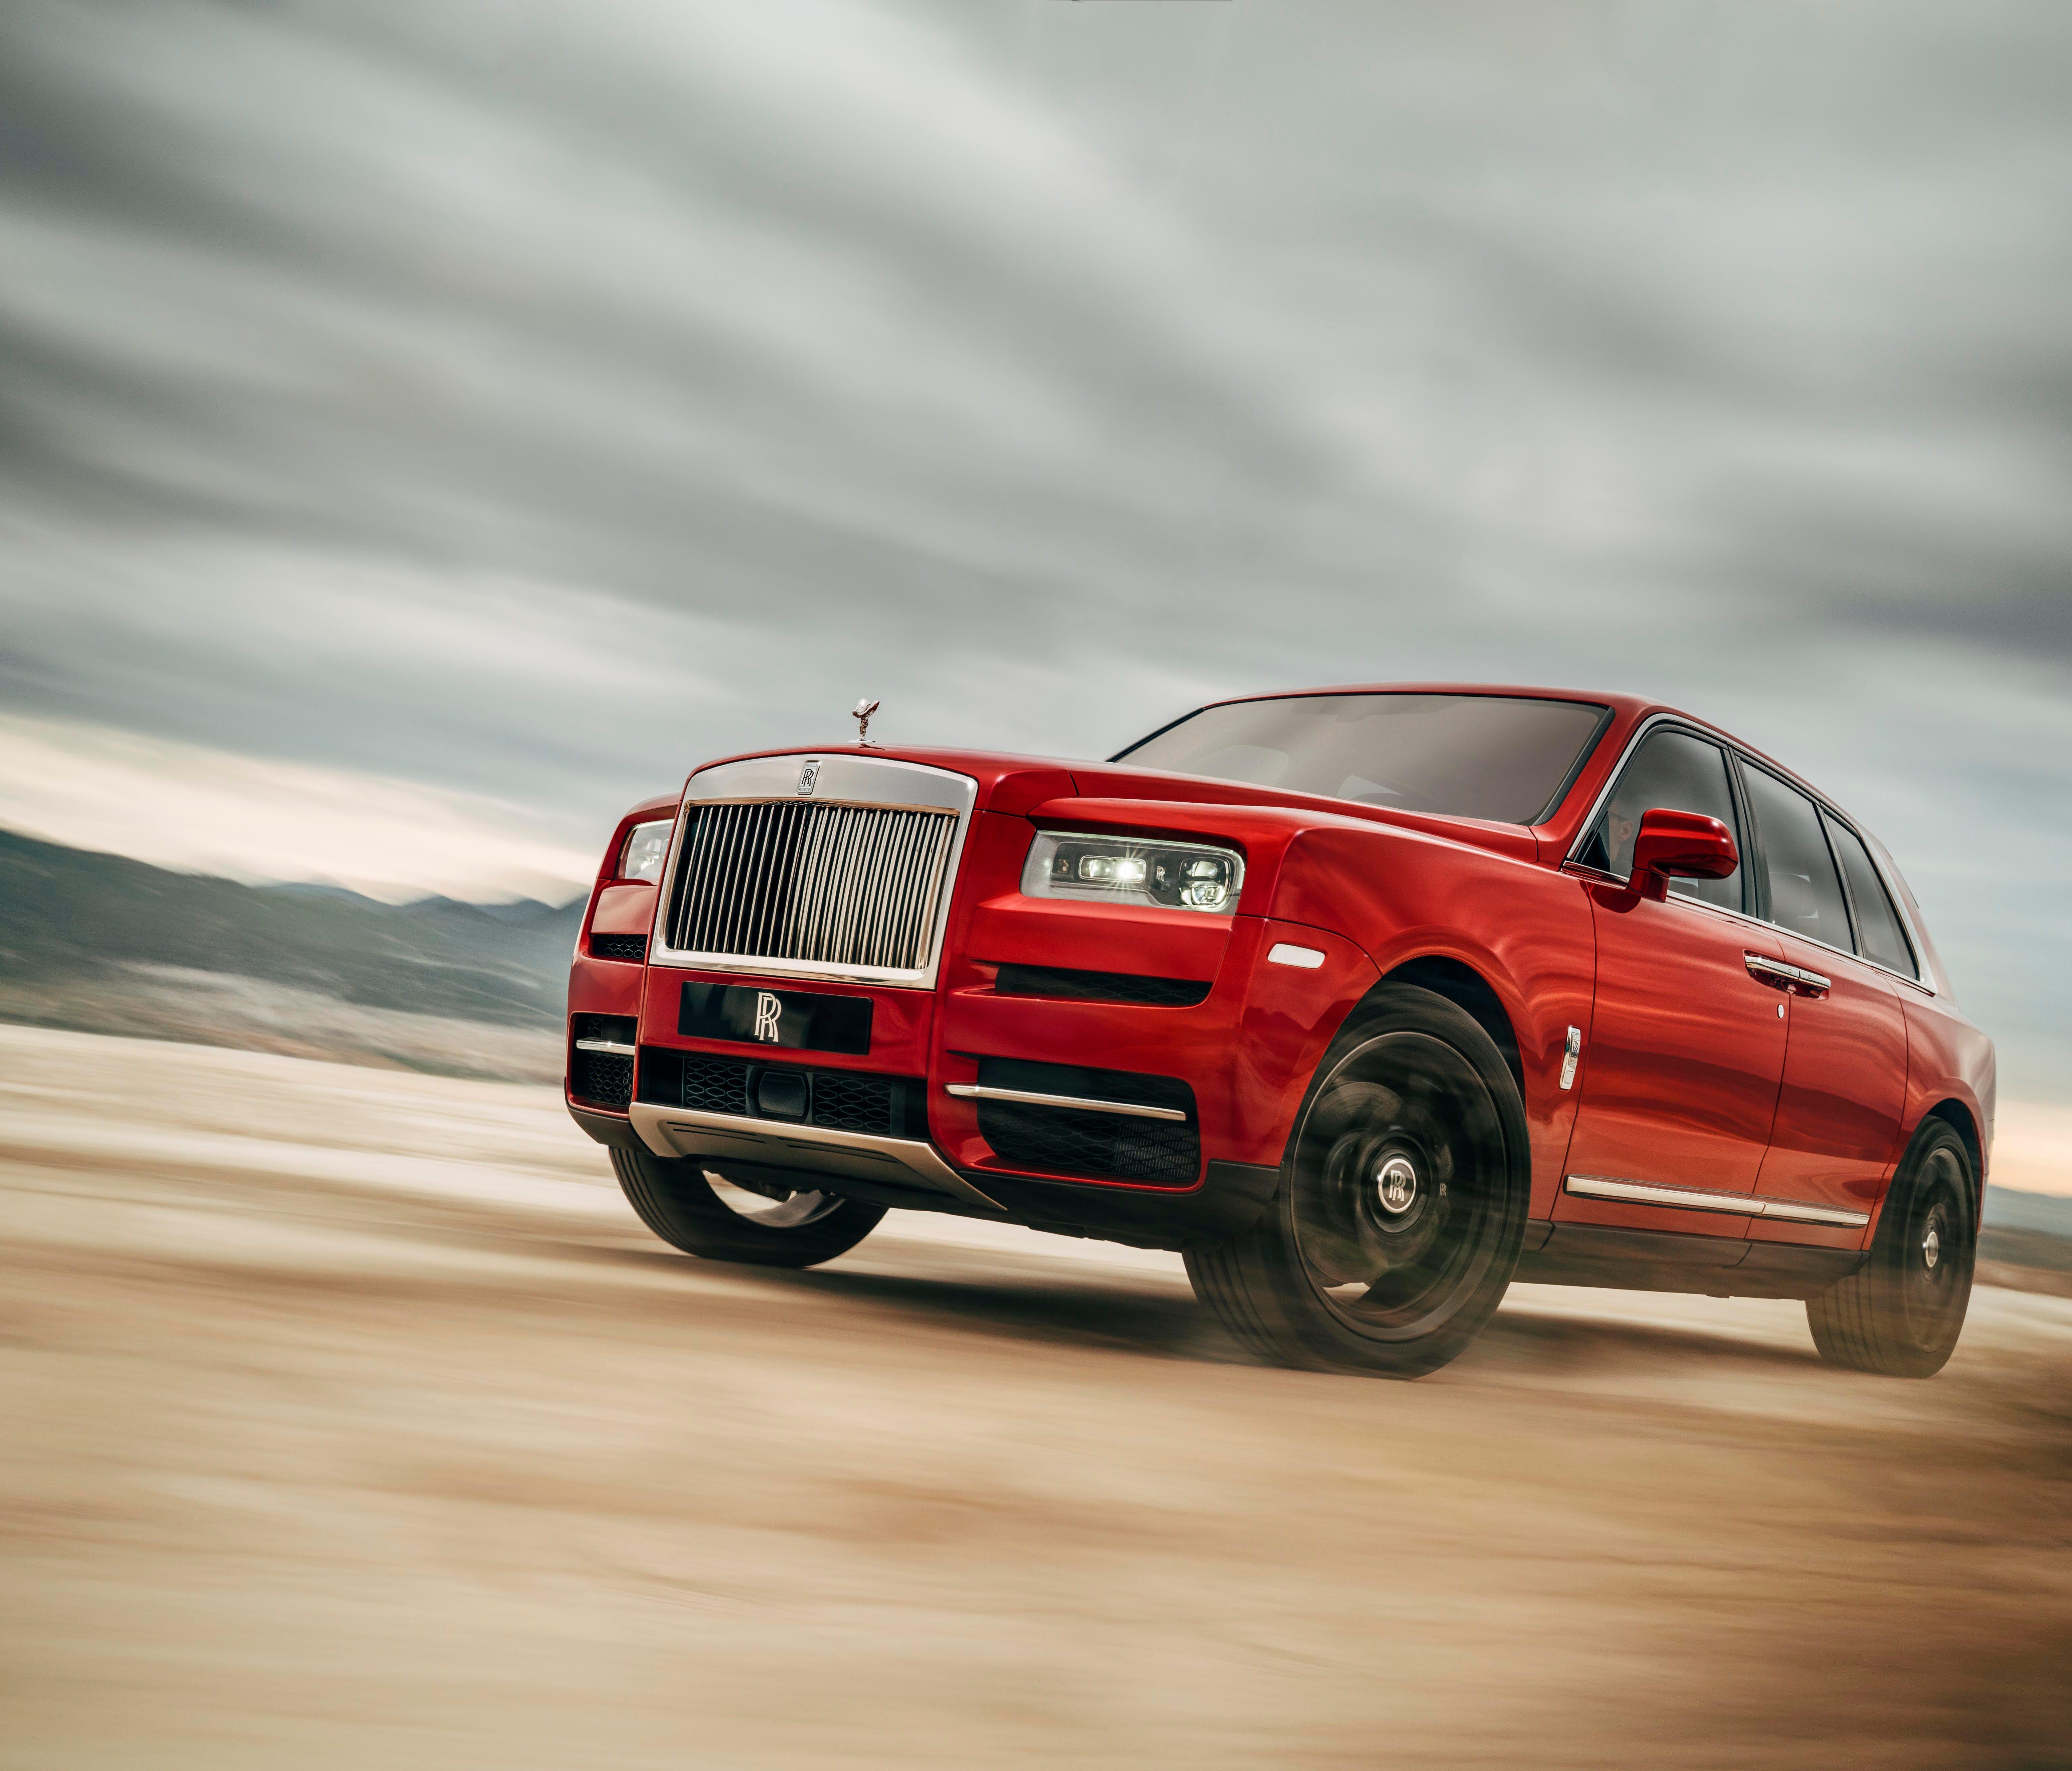 Rolls-Royce unveils the Cullinan SUV